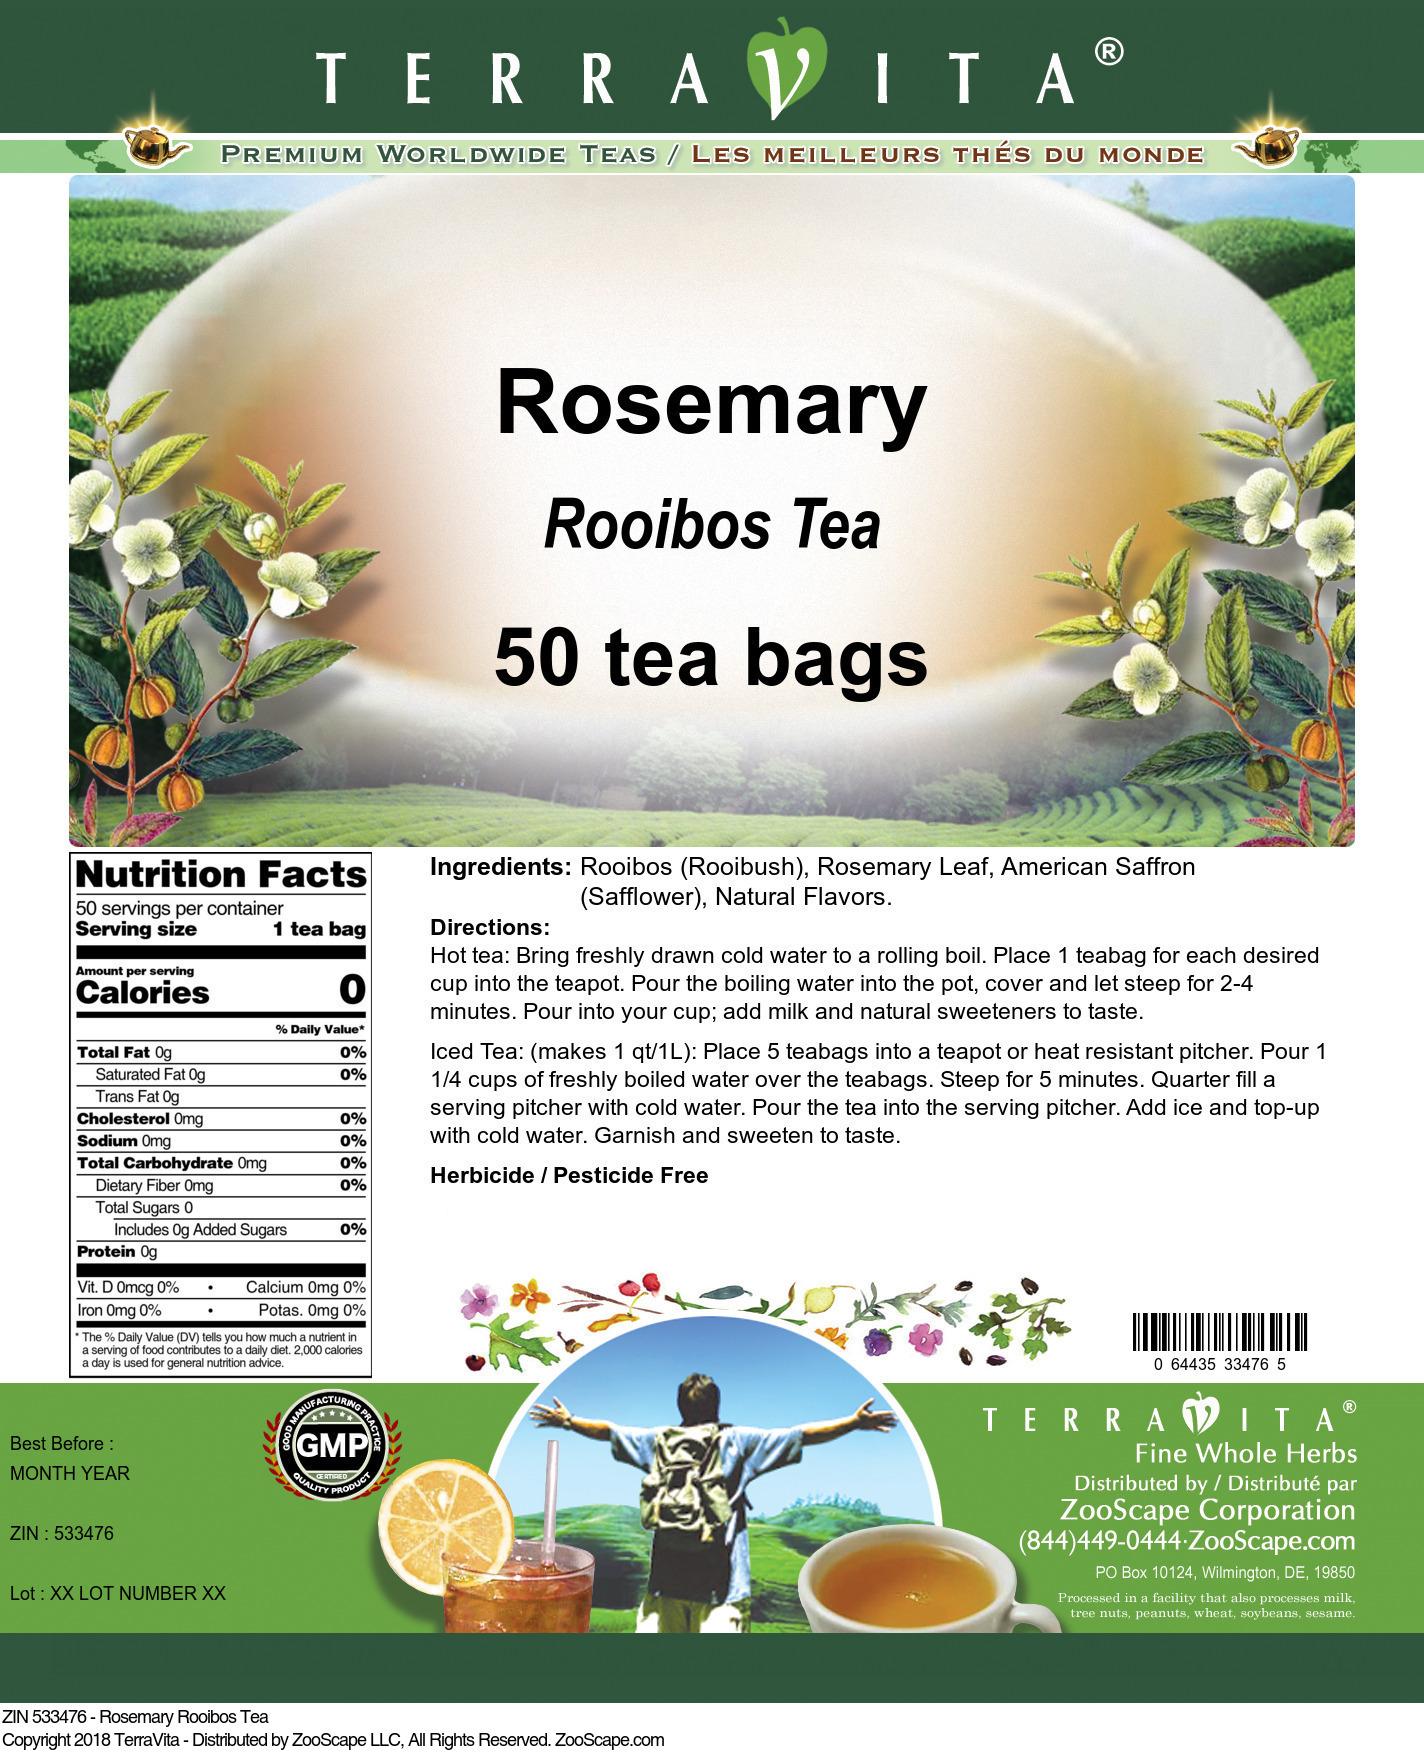 Rosemary Rooibos Tea